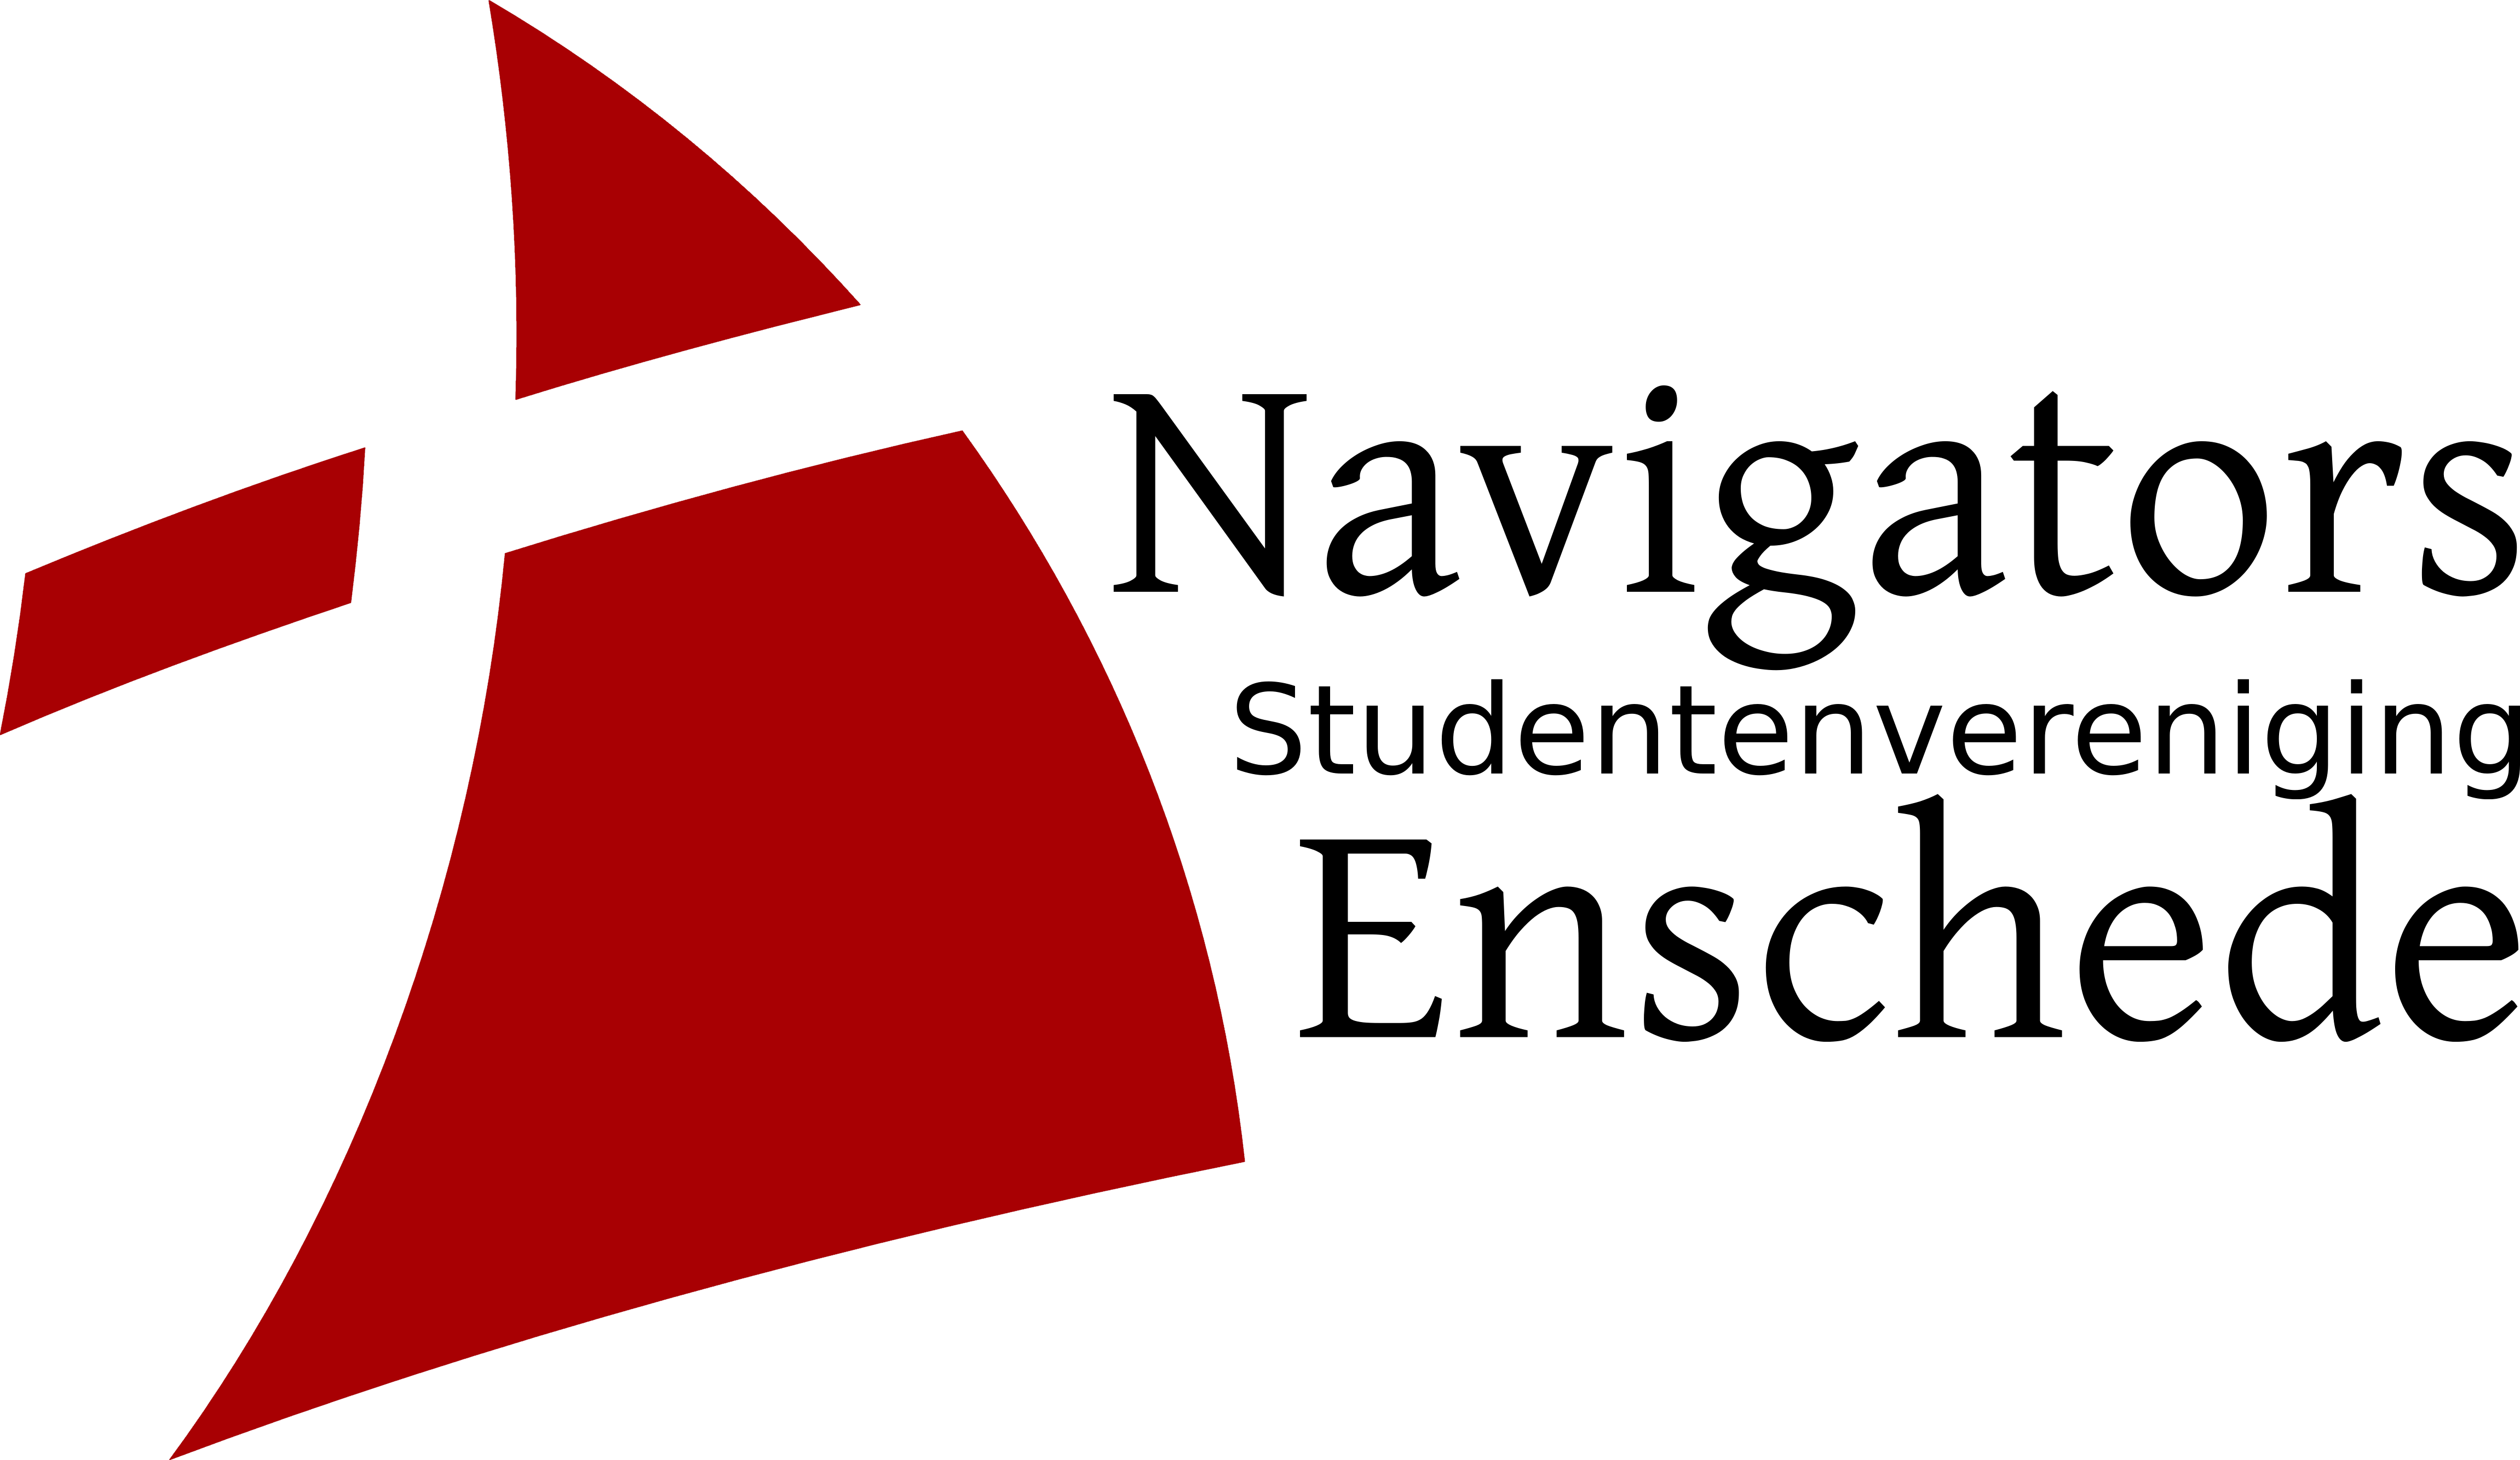 Navigators studentenvereniging Enschede